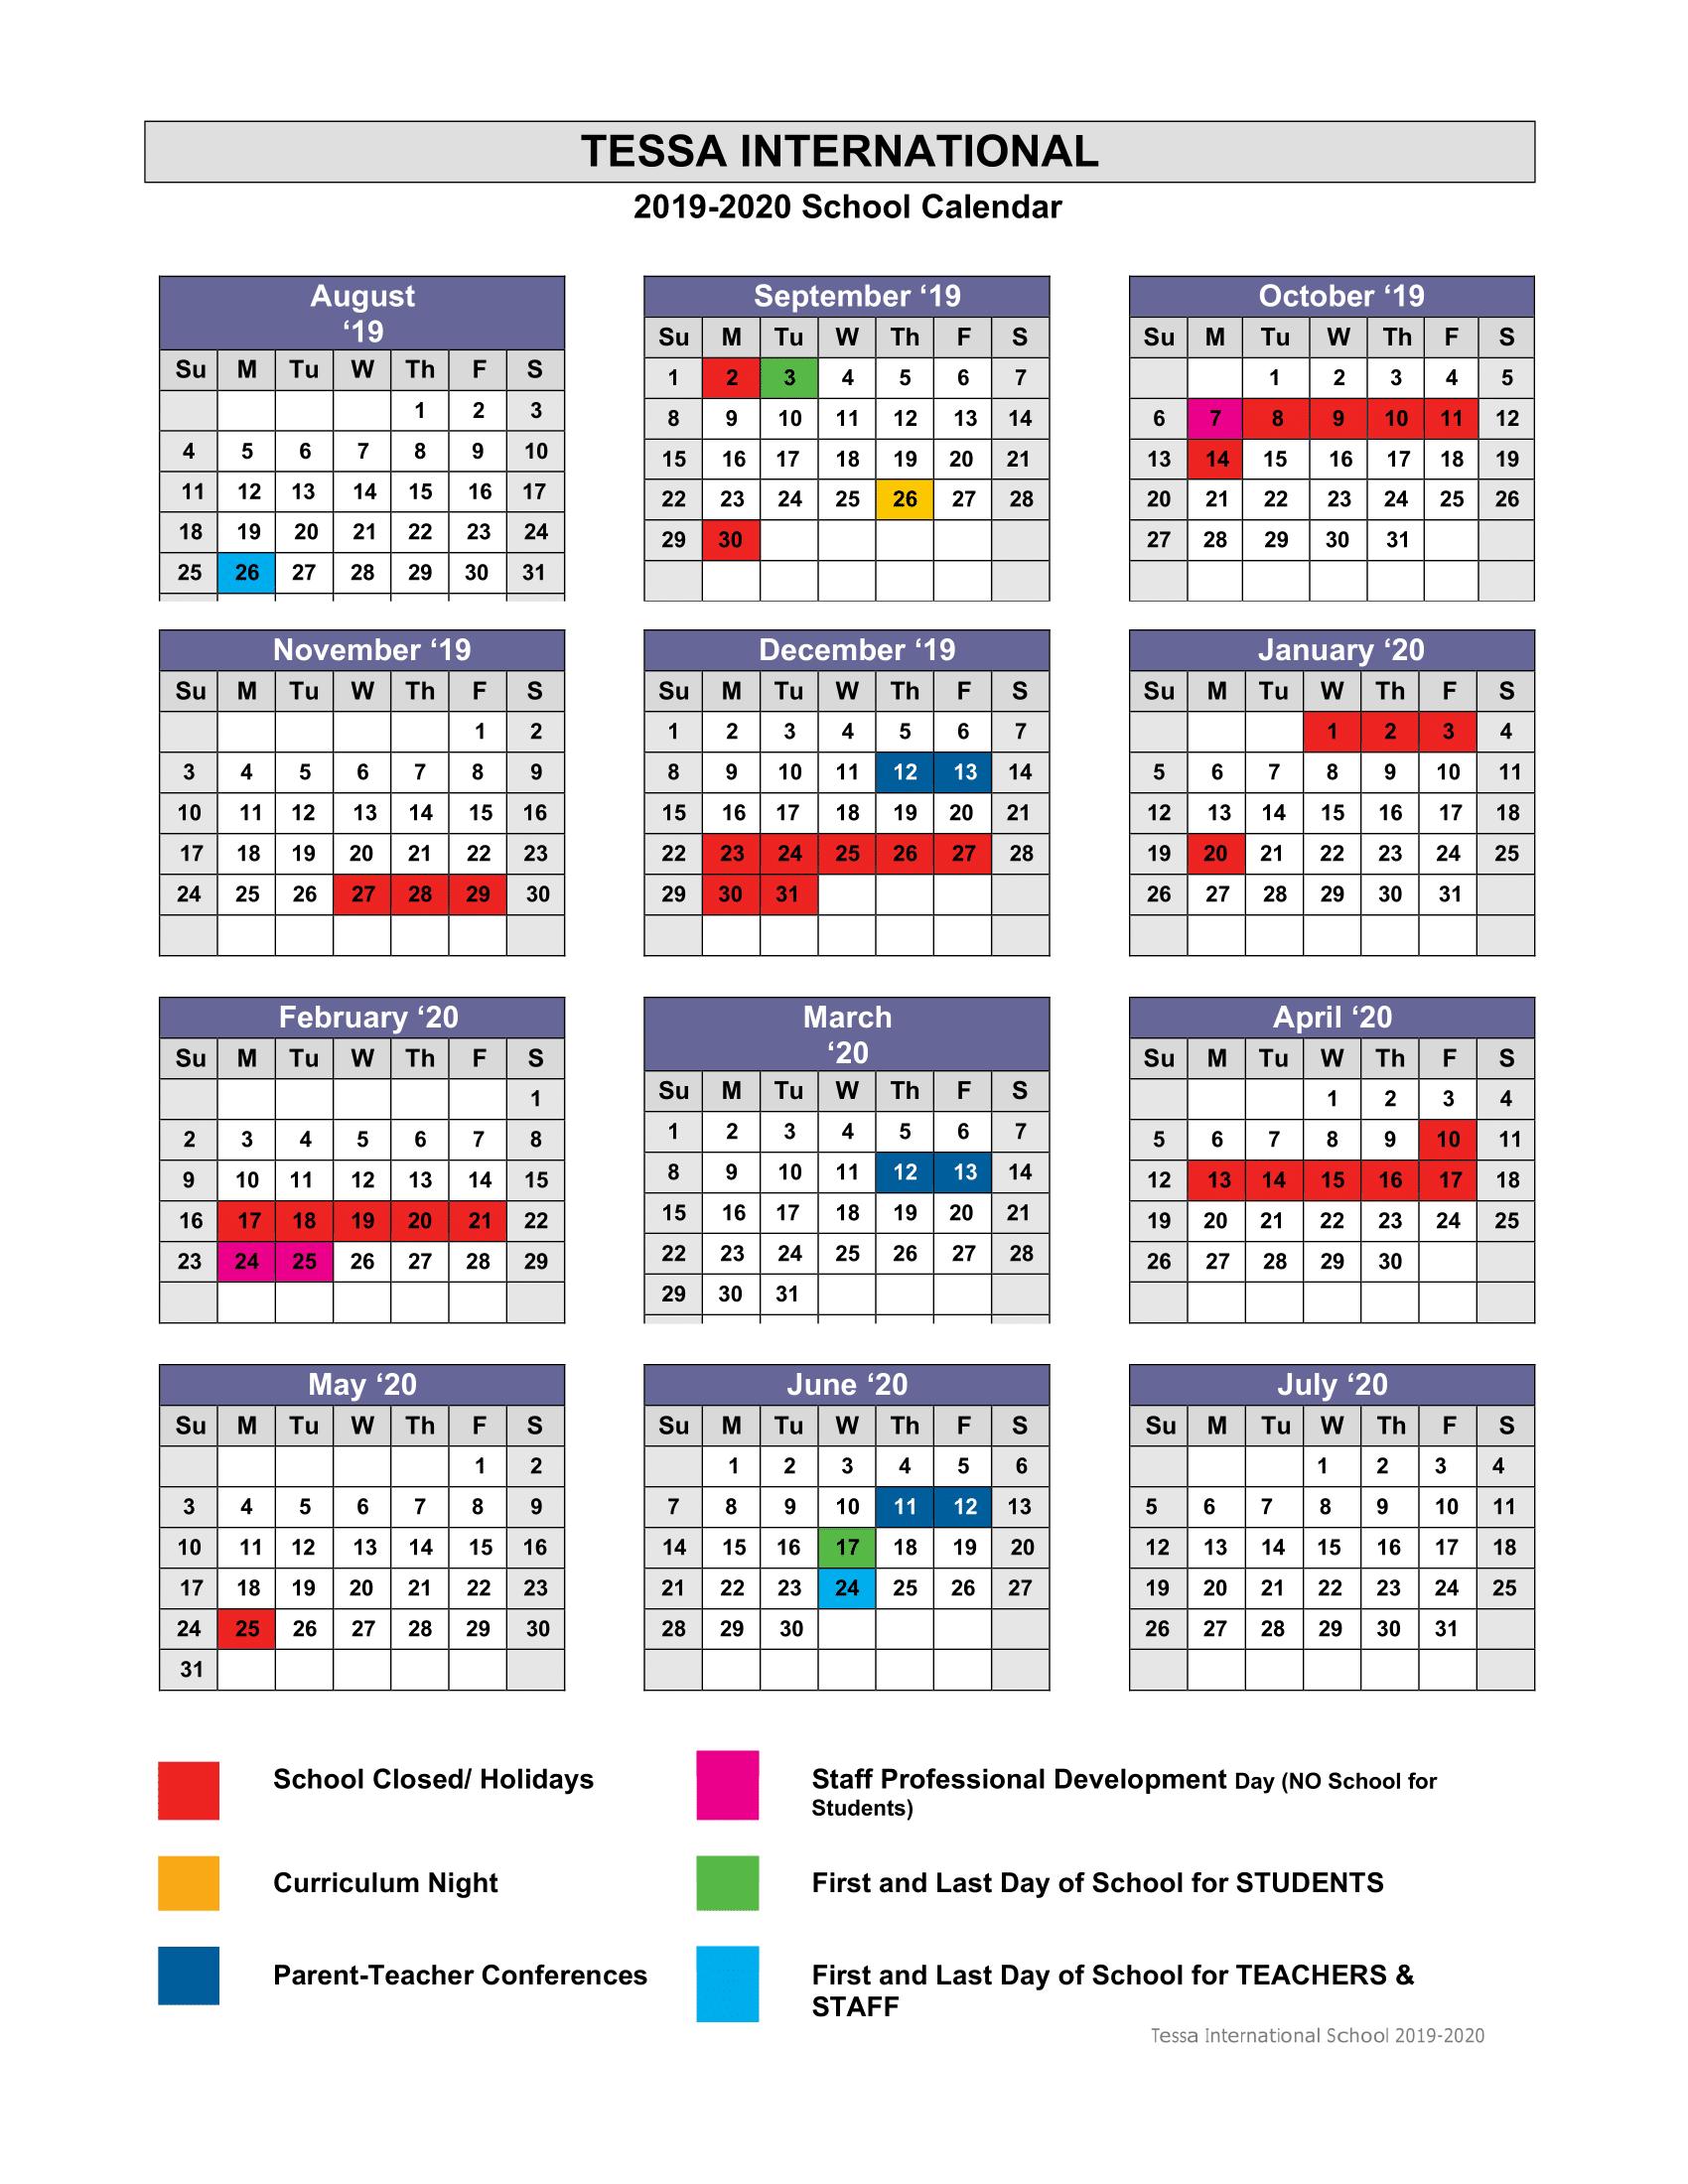 Academic Calendar 2019 2020 – Tessa International School Intended For New Canaan School Calendar